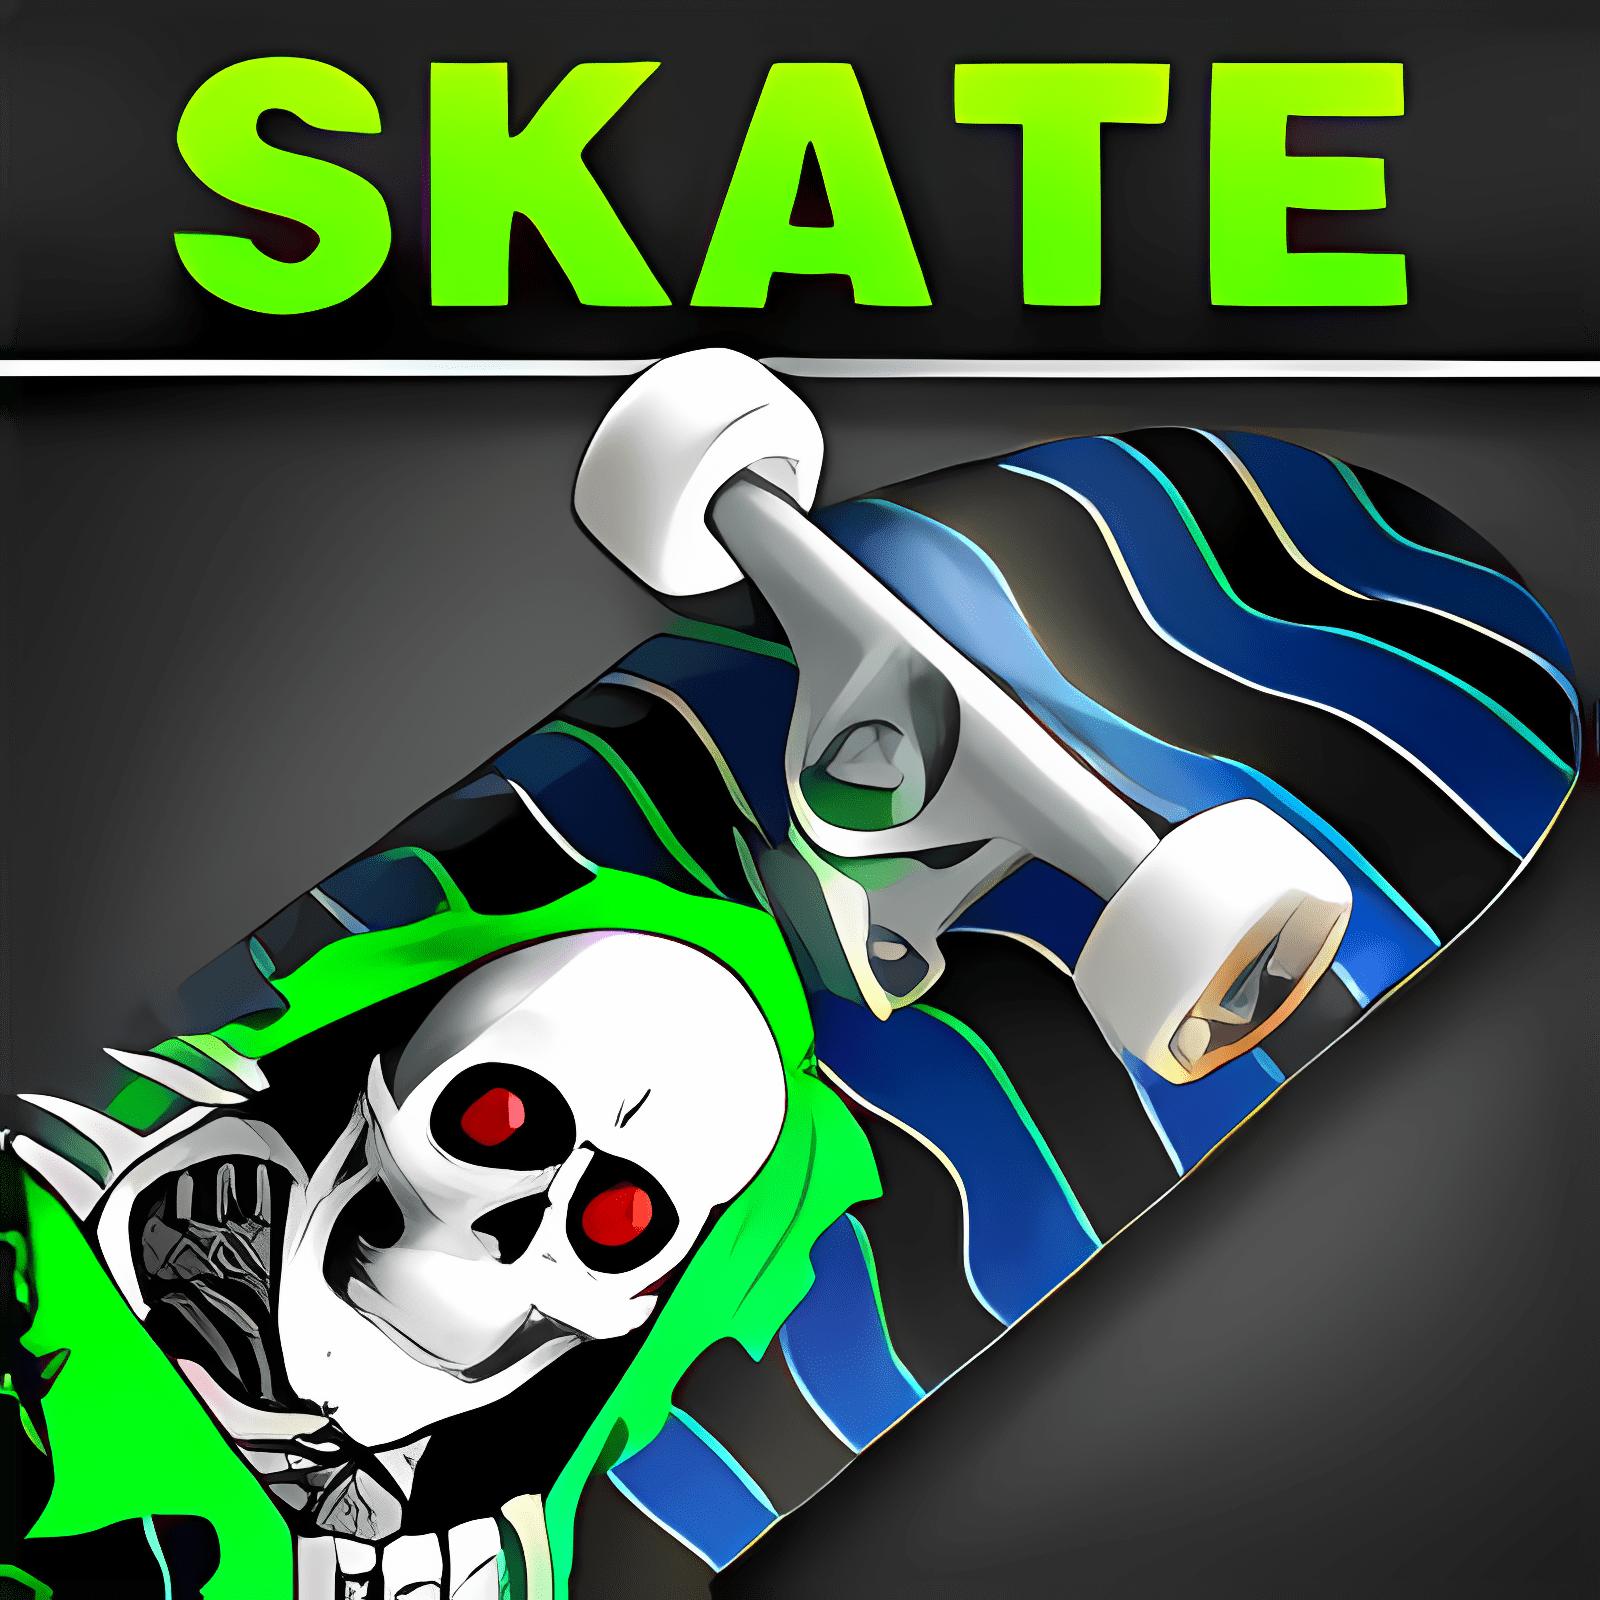 Skateboard Party 2 per Windows 10